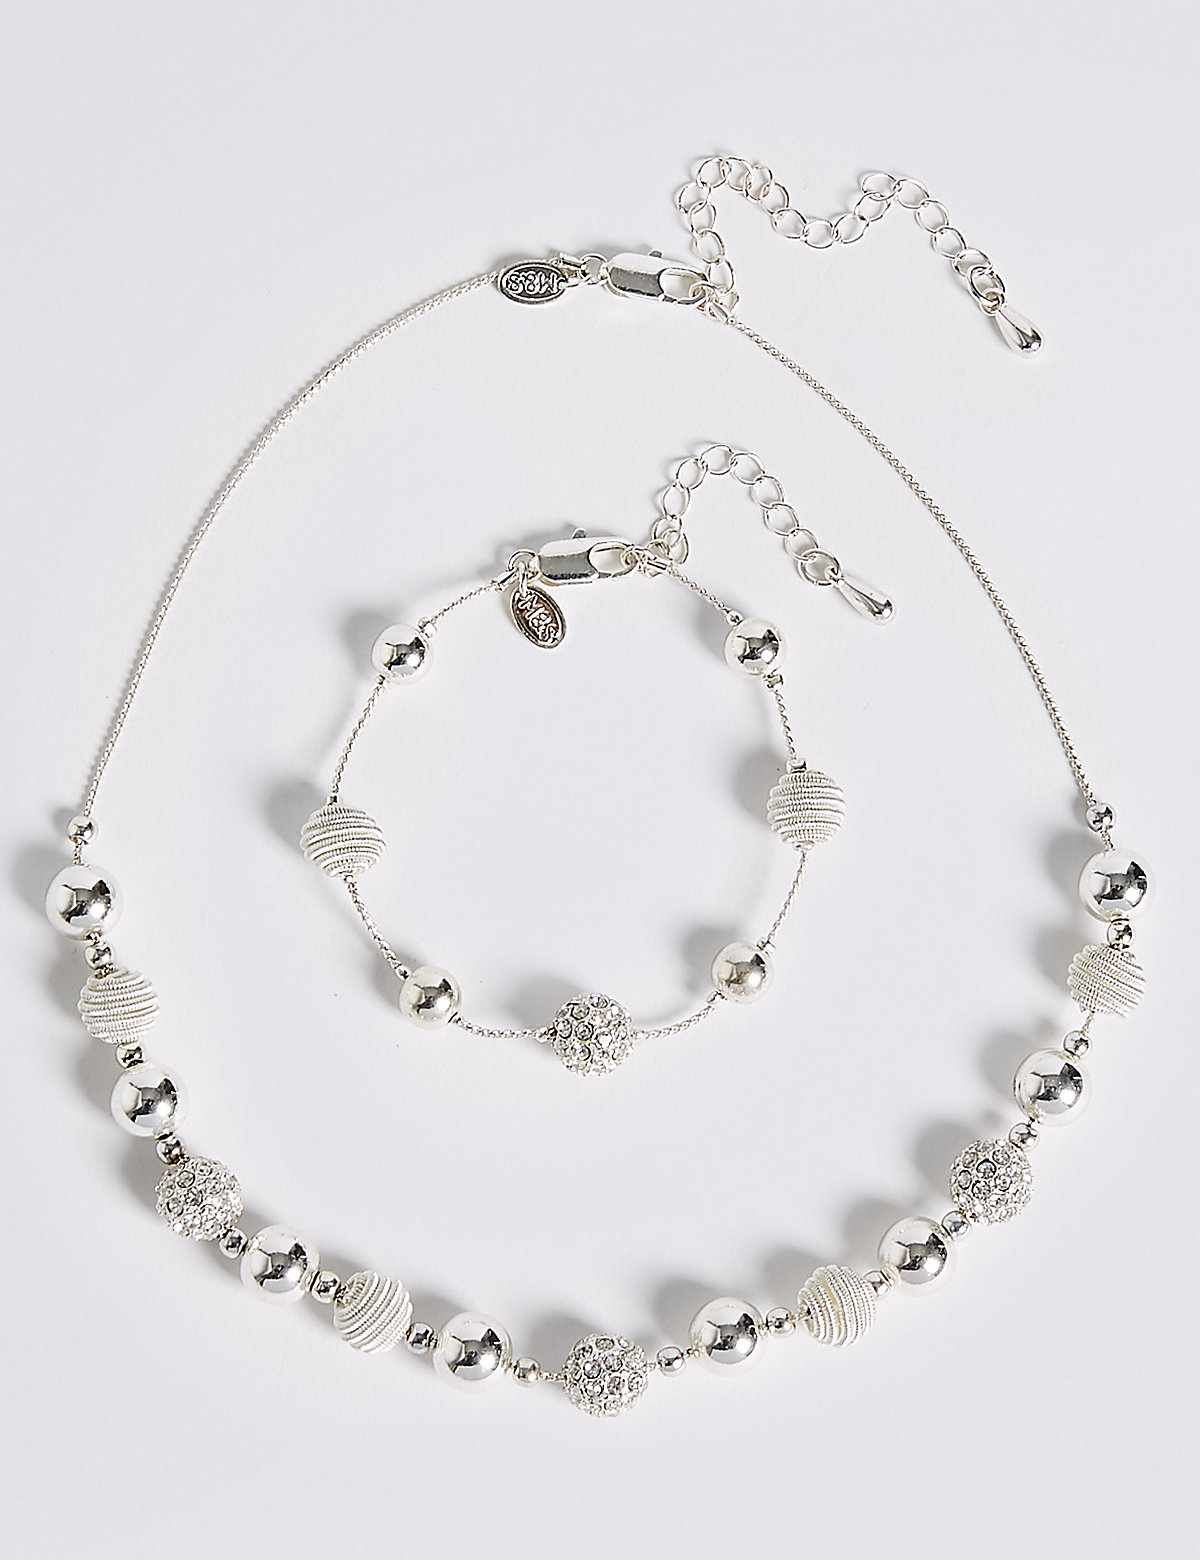 M&S Collection Silver Plated Sandblast Sandblast Necklace & Bracelet Set